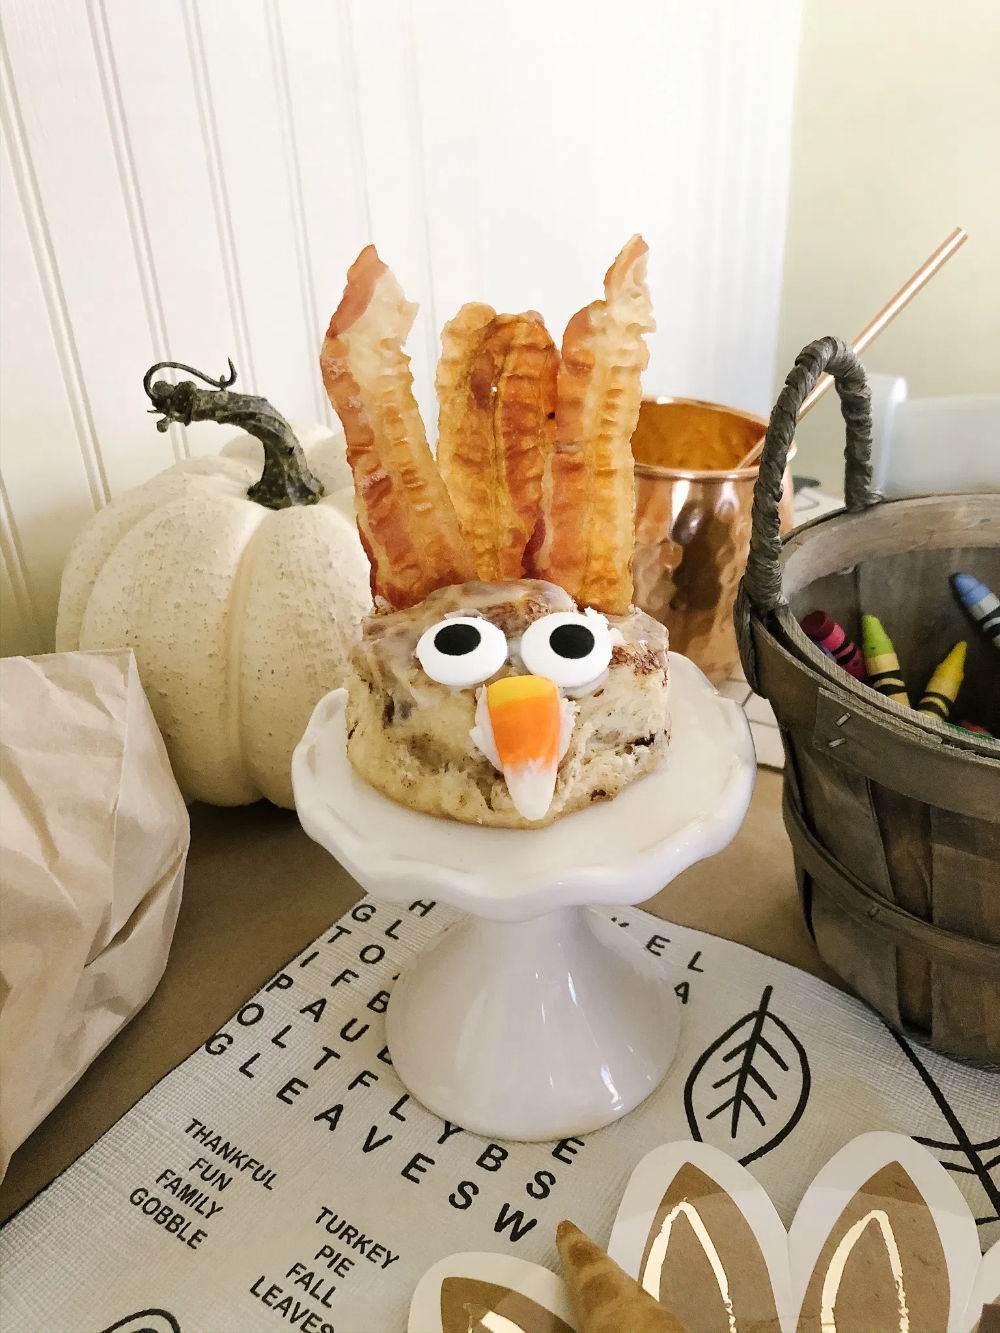 November KidSpread Cinnamon roll turkeys, Favorite